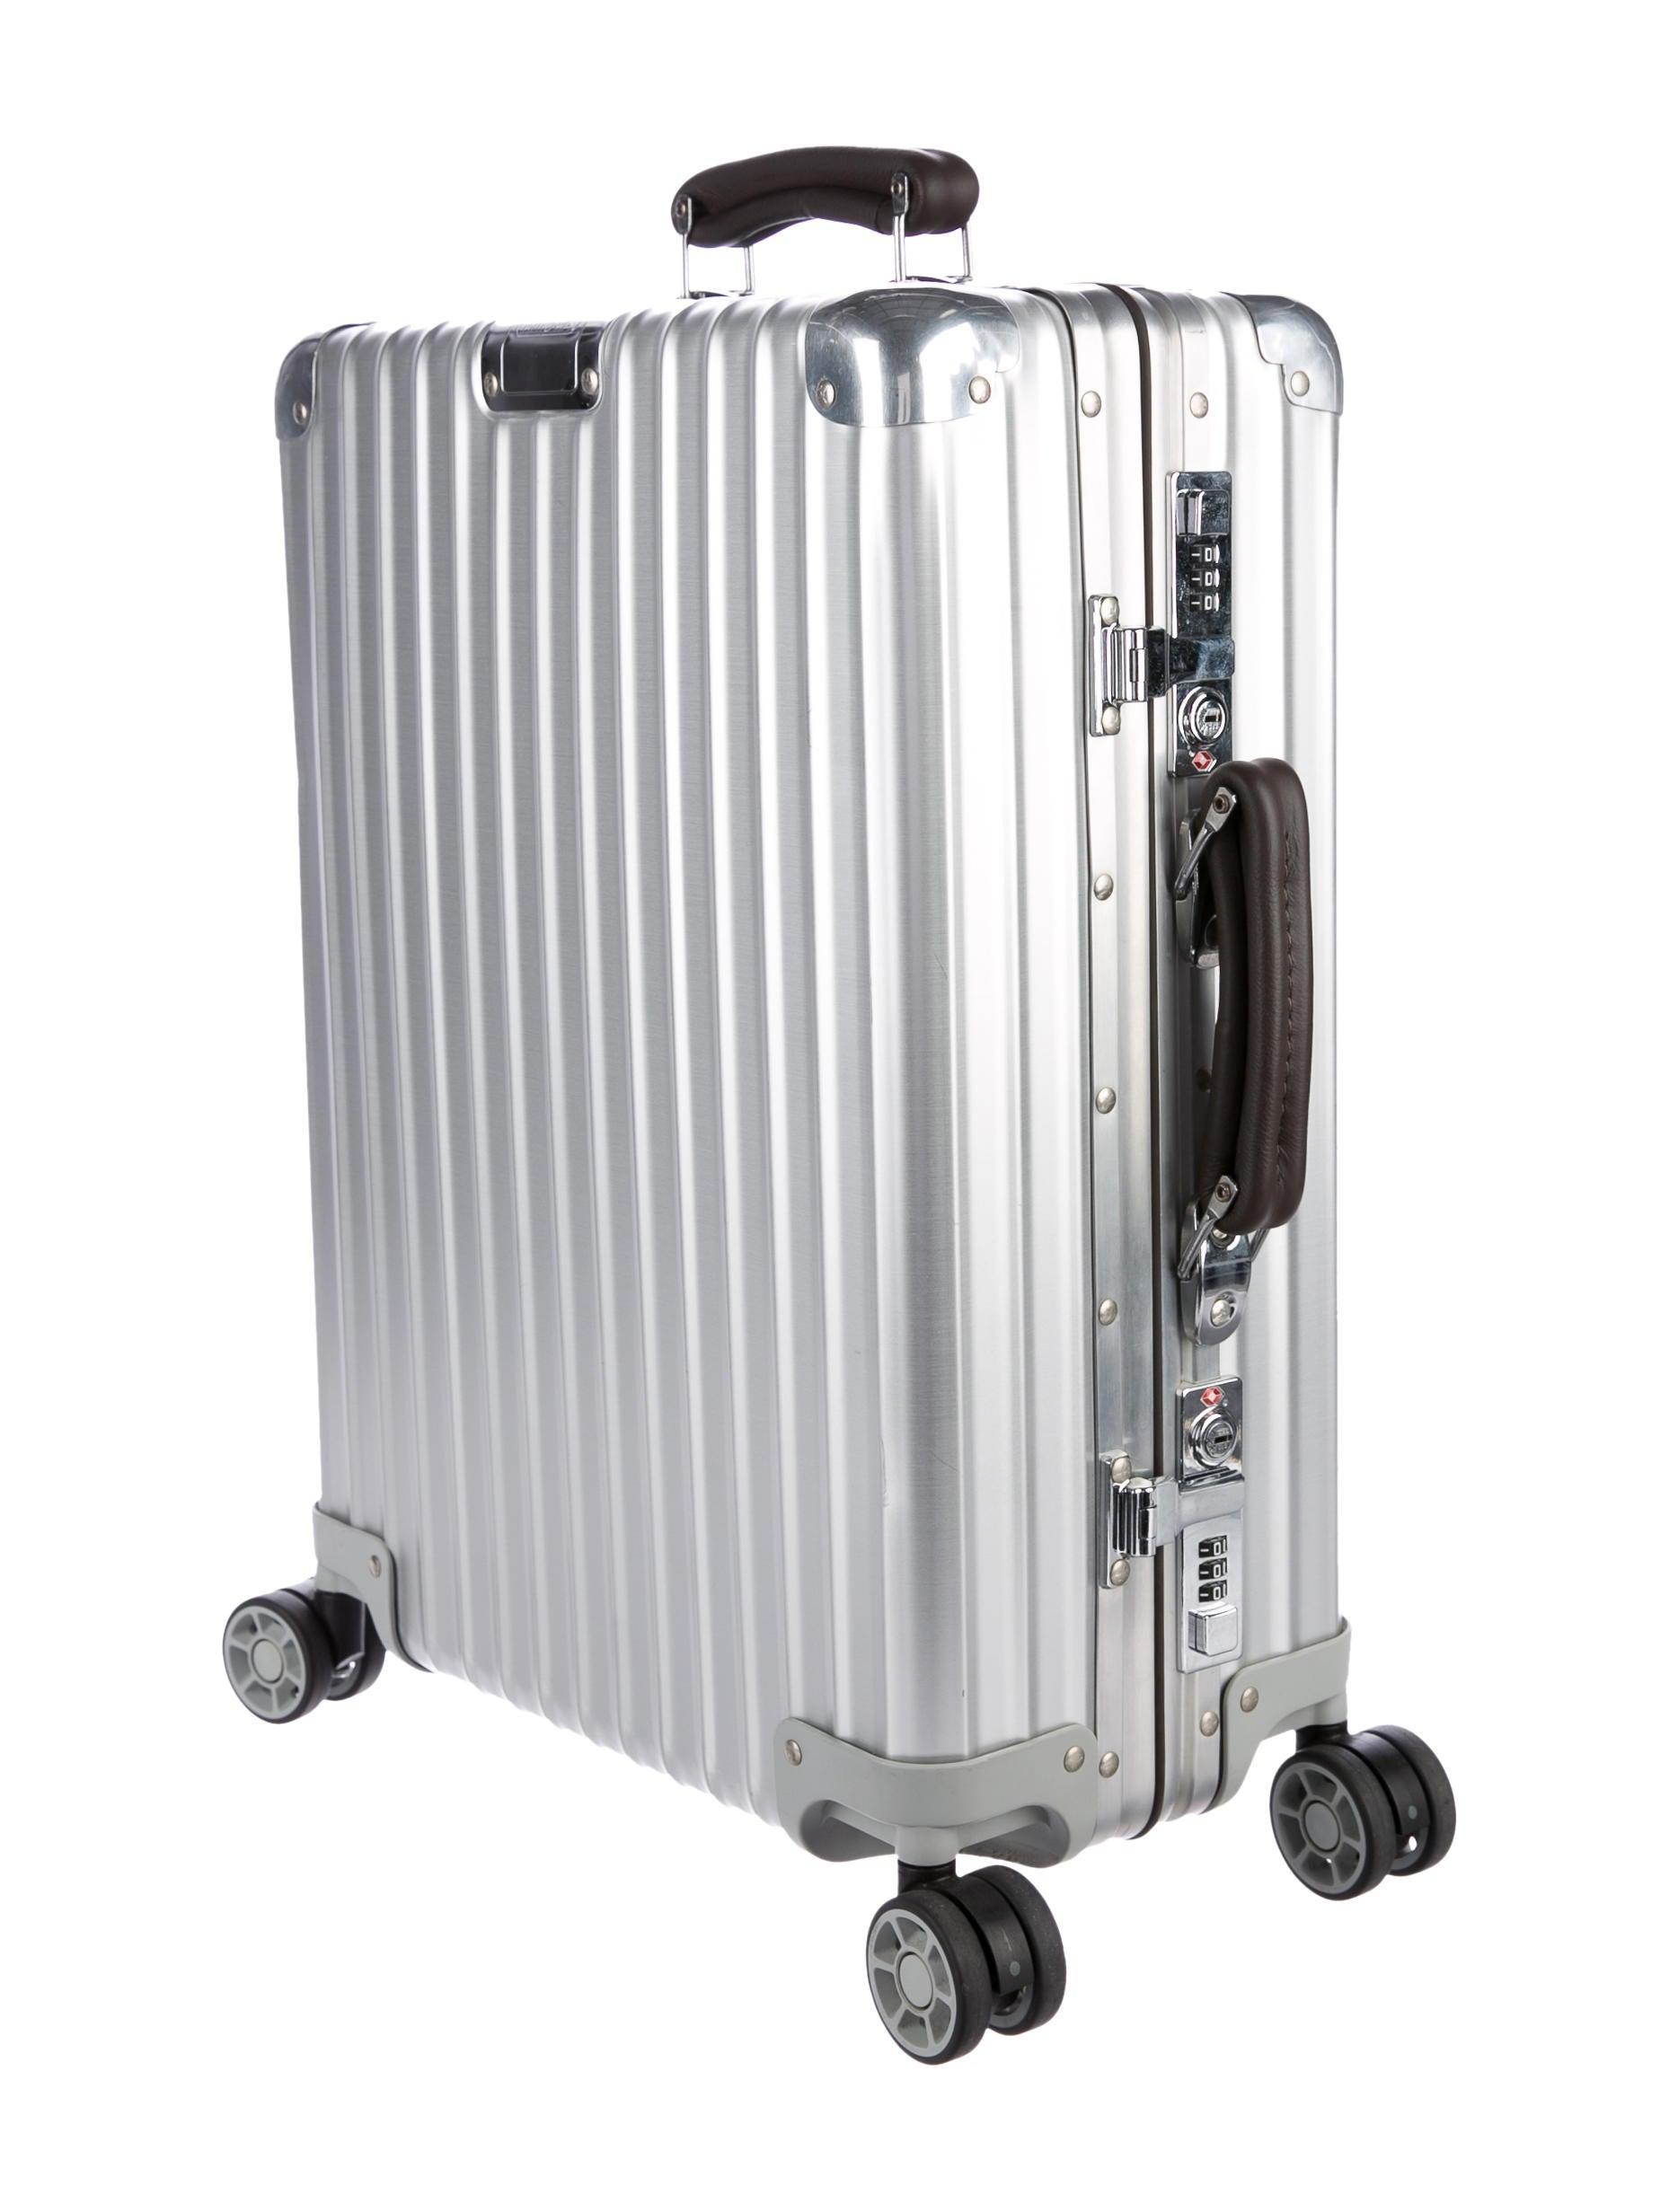 rimowa classic flight cabin multiwheel 33 0l trolley. Black Bedroom Furniture Sets. Home Design Ideas